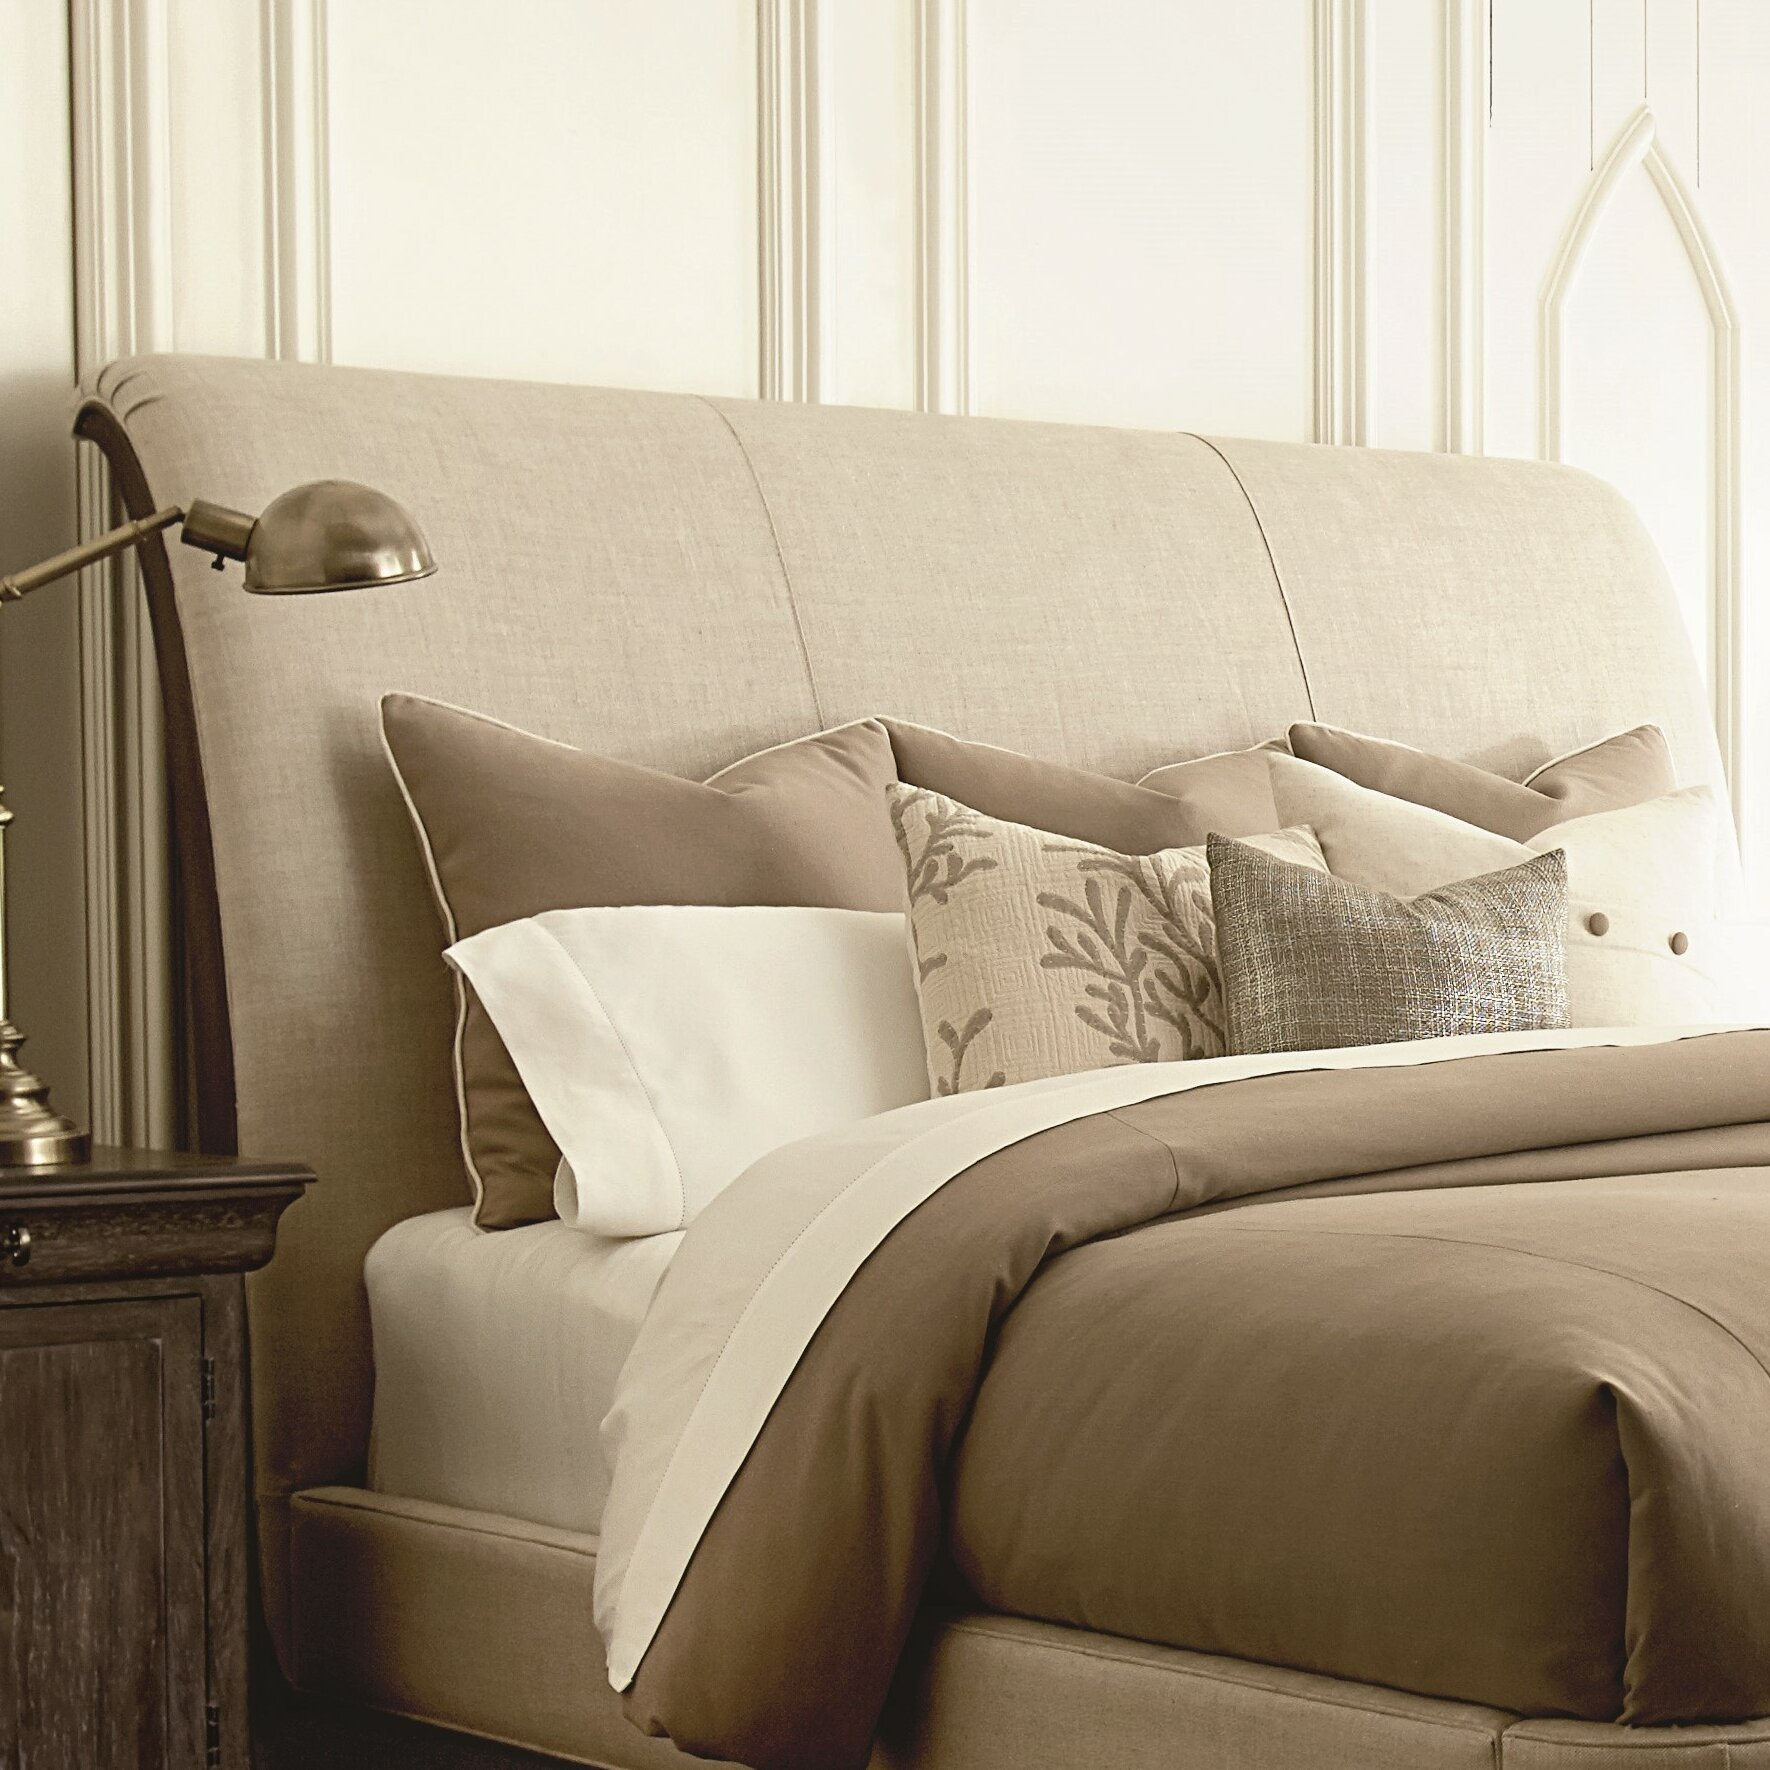 a r t st germain upholstered sleigh bed amp reviews wayfair art furniture st germain 6 piece queen upholstered